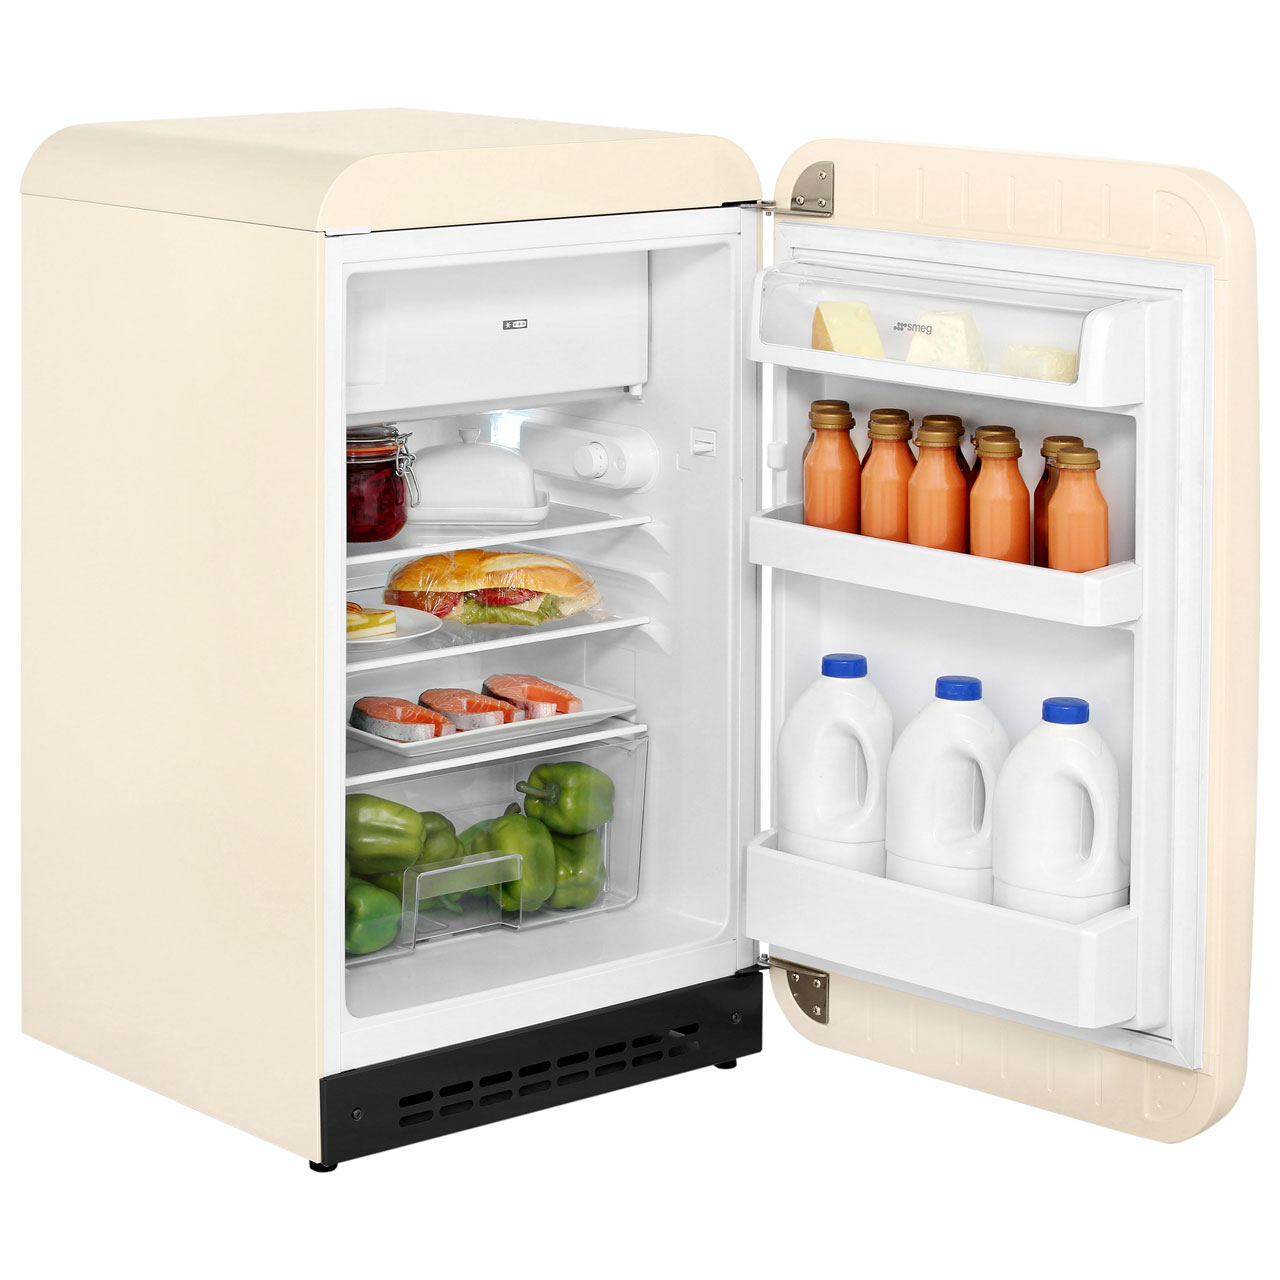 Boots kitchen appliances washing machines fridges more for Frigo vintage smeg